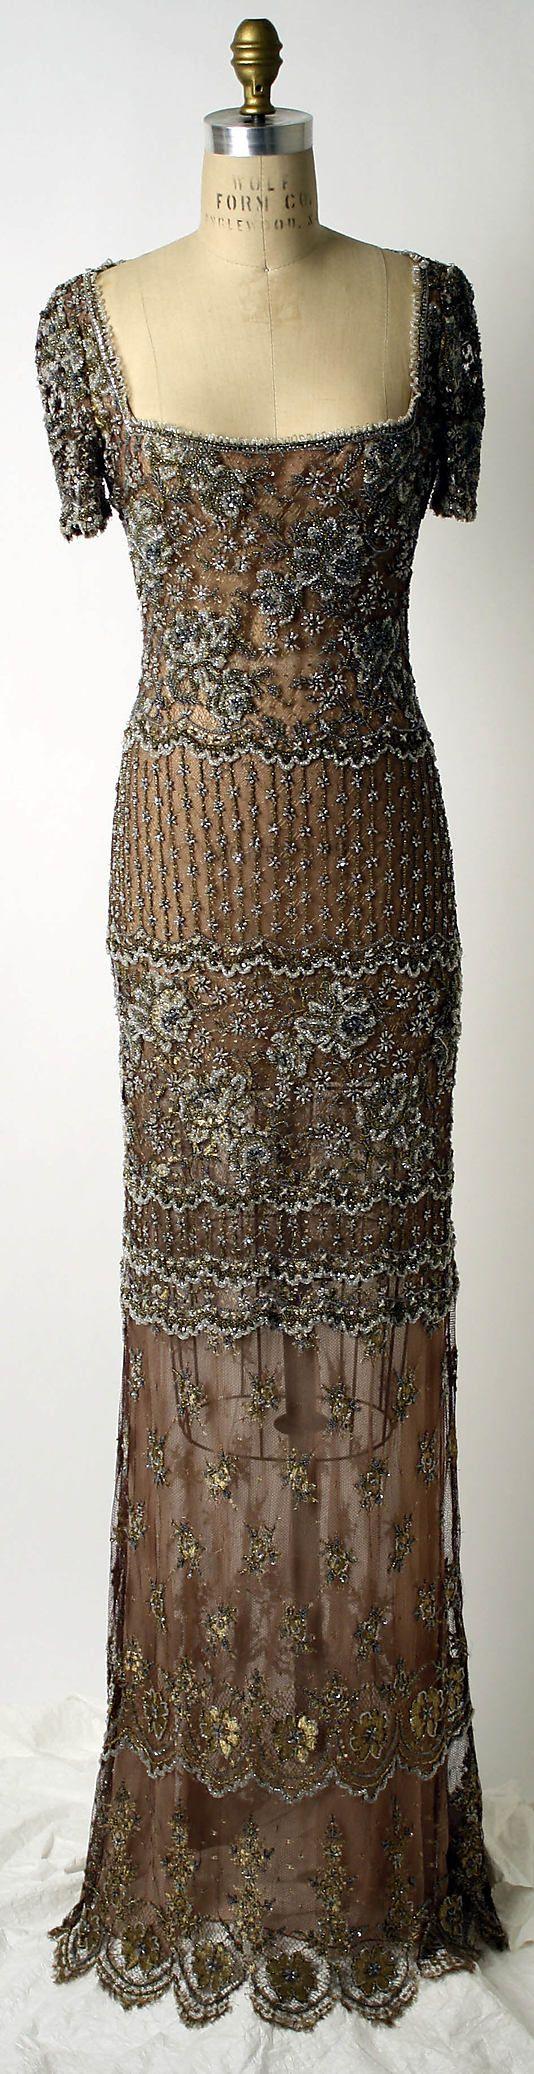 Evening dress Badgley Mischka 1997-98